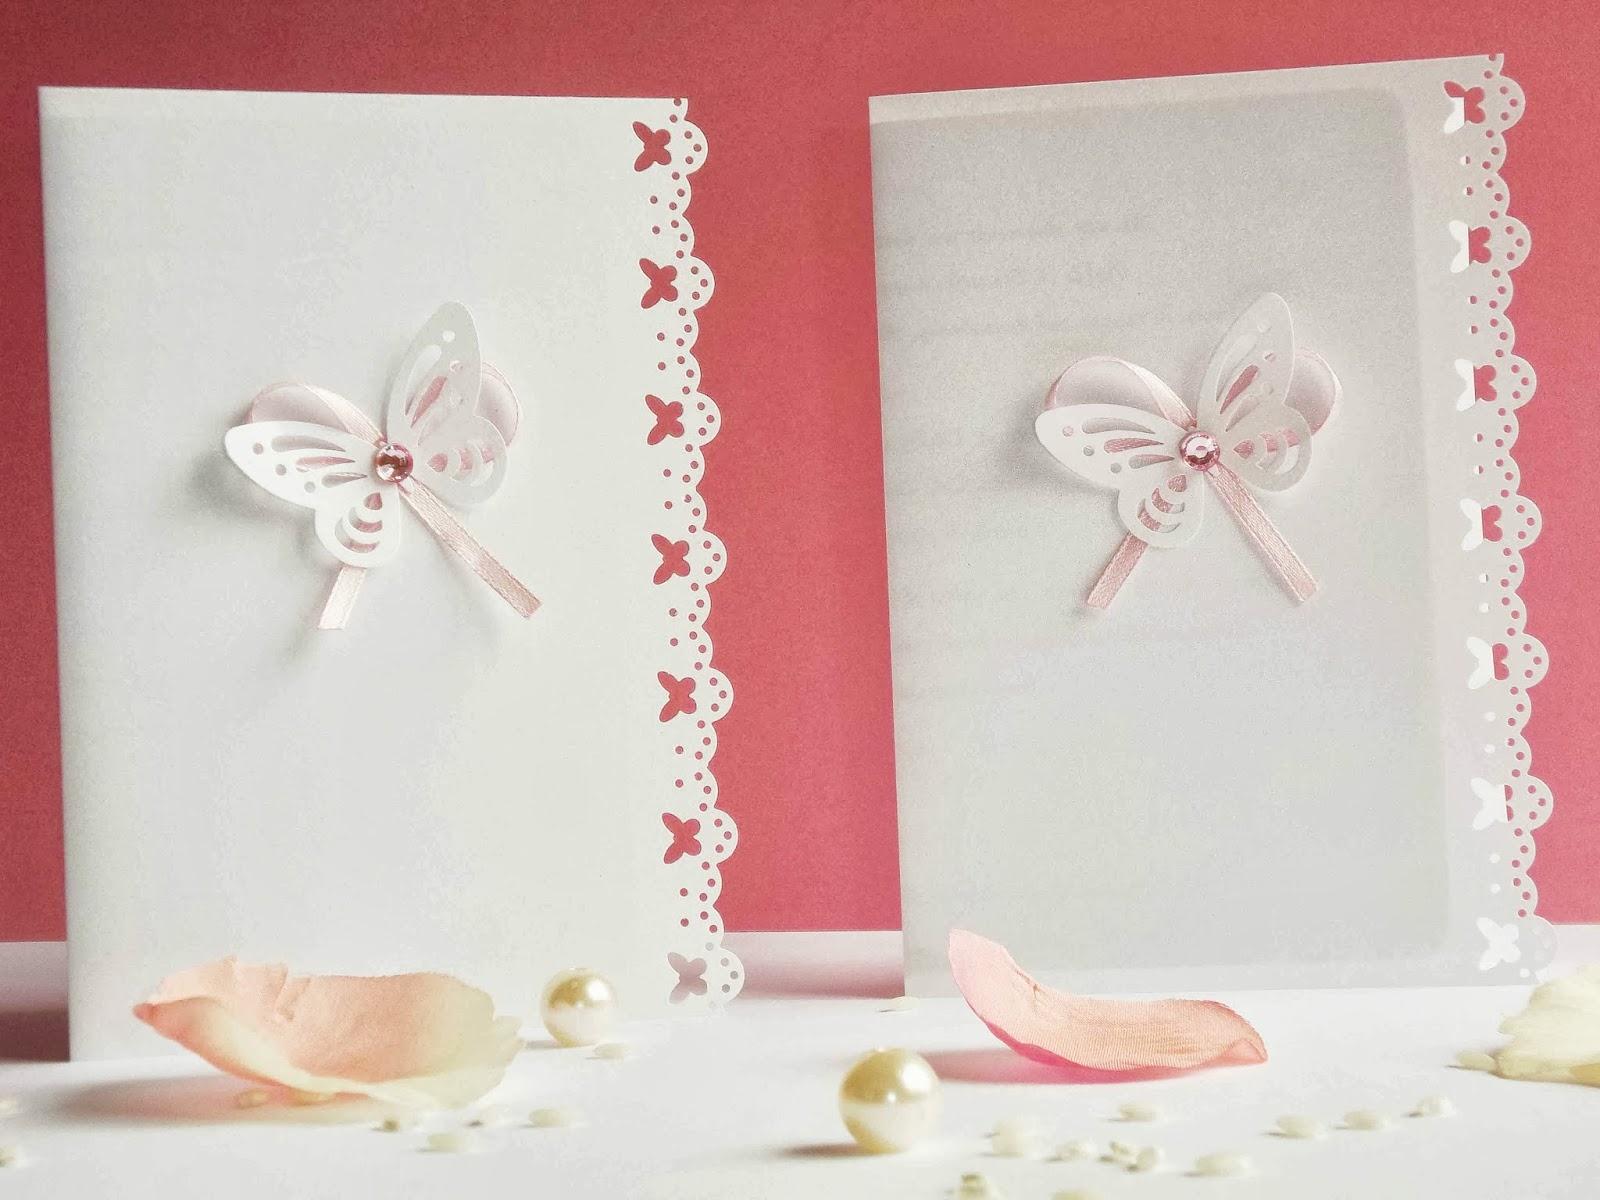 Matrimonio Tema Farfalla : Sara crea creazioni per battesimo bimba o matrimonio tema